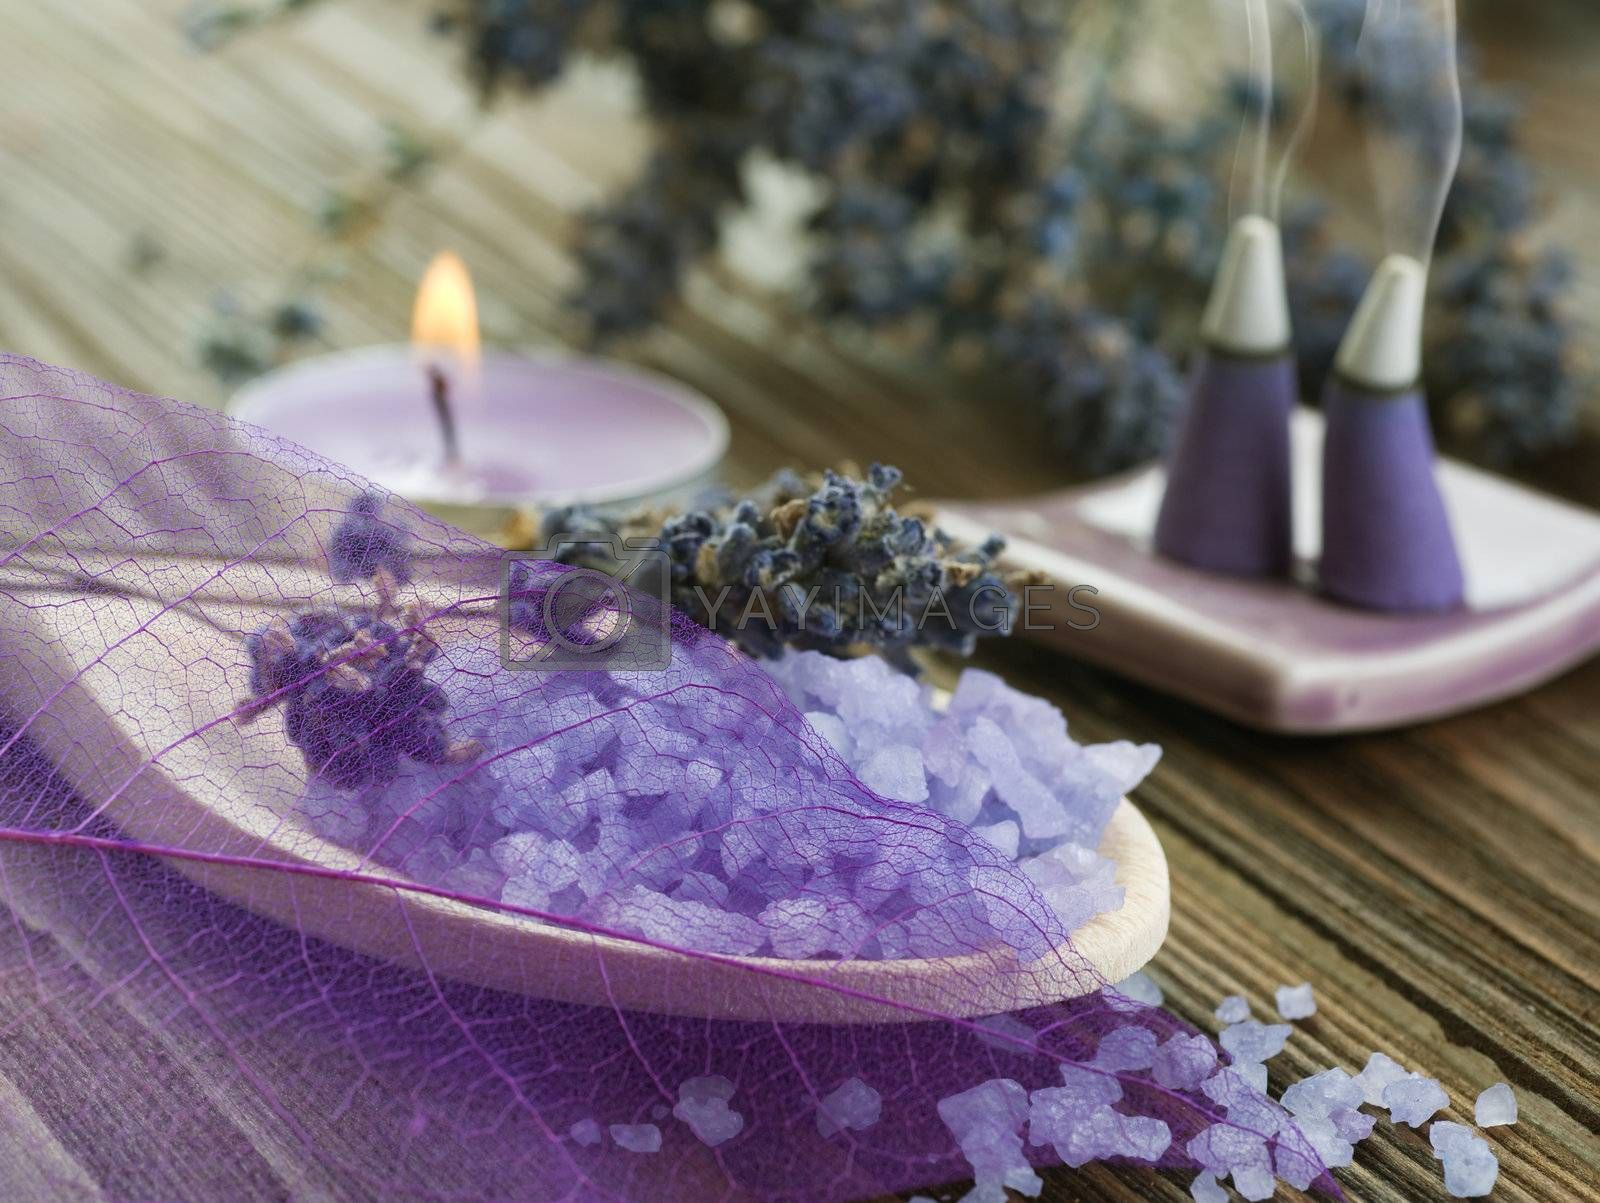 Lavender Spa Treatment  by Subbotina Anna